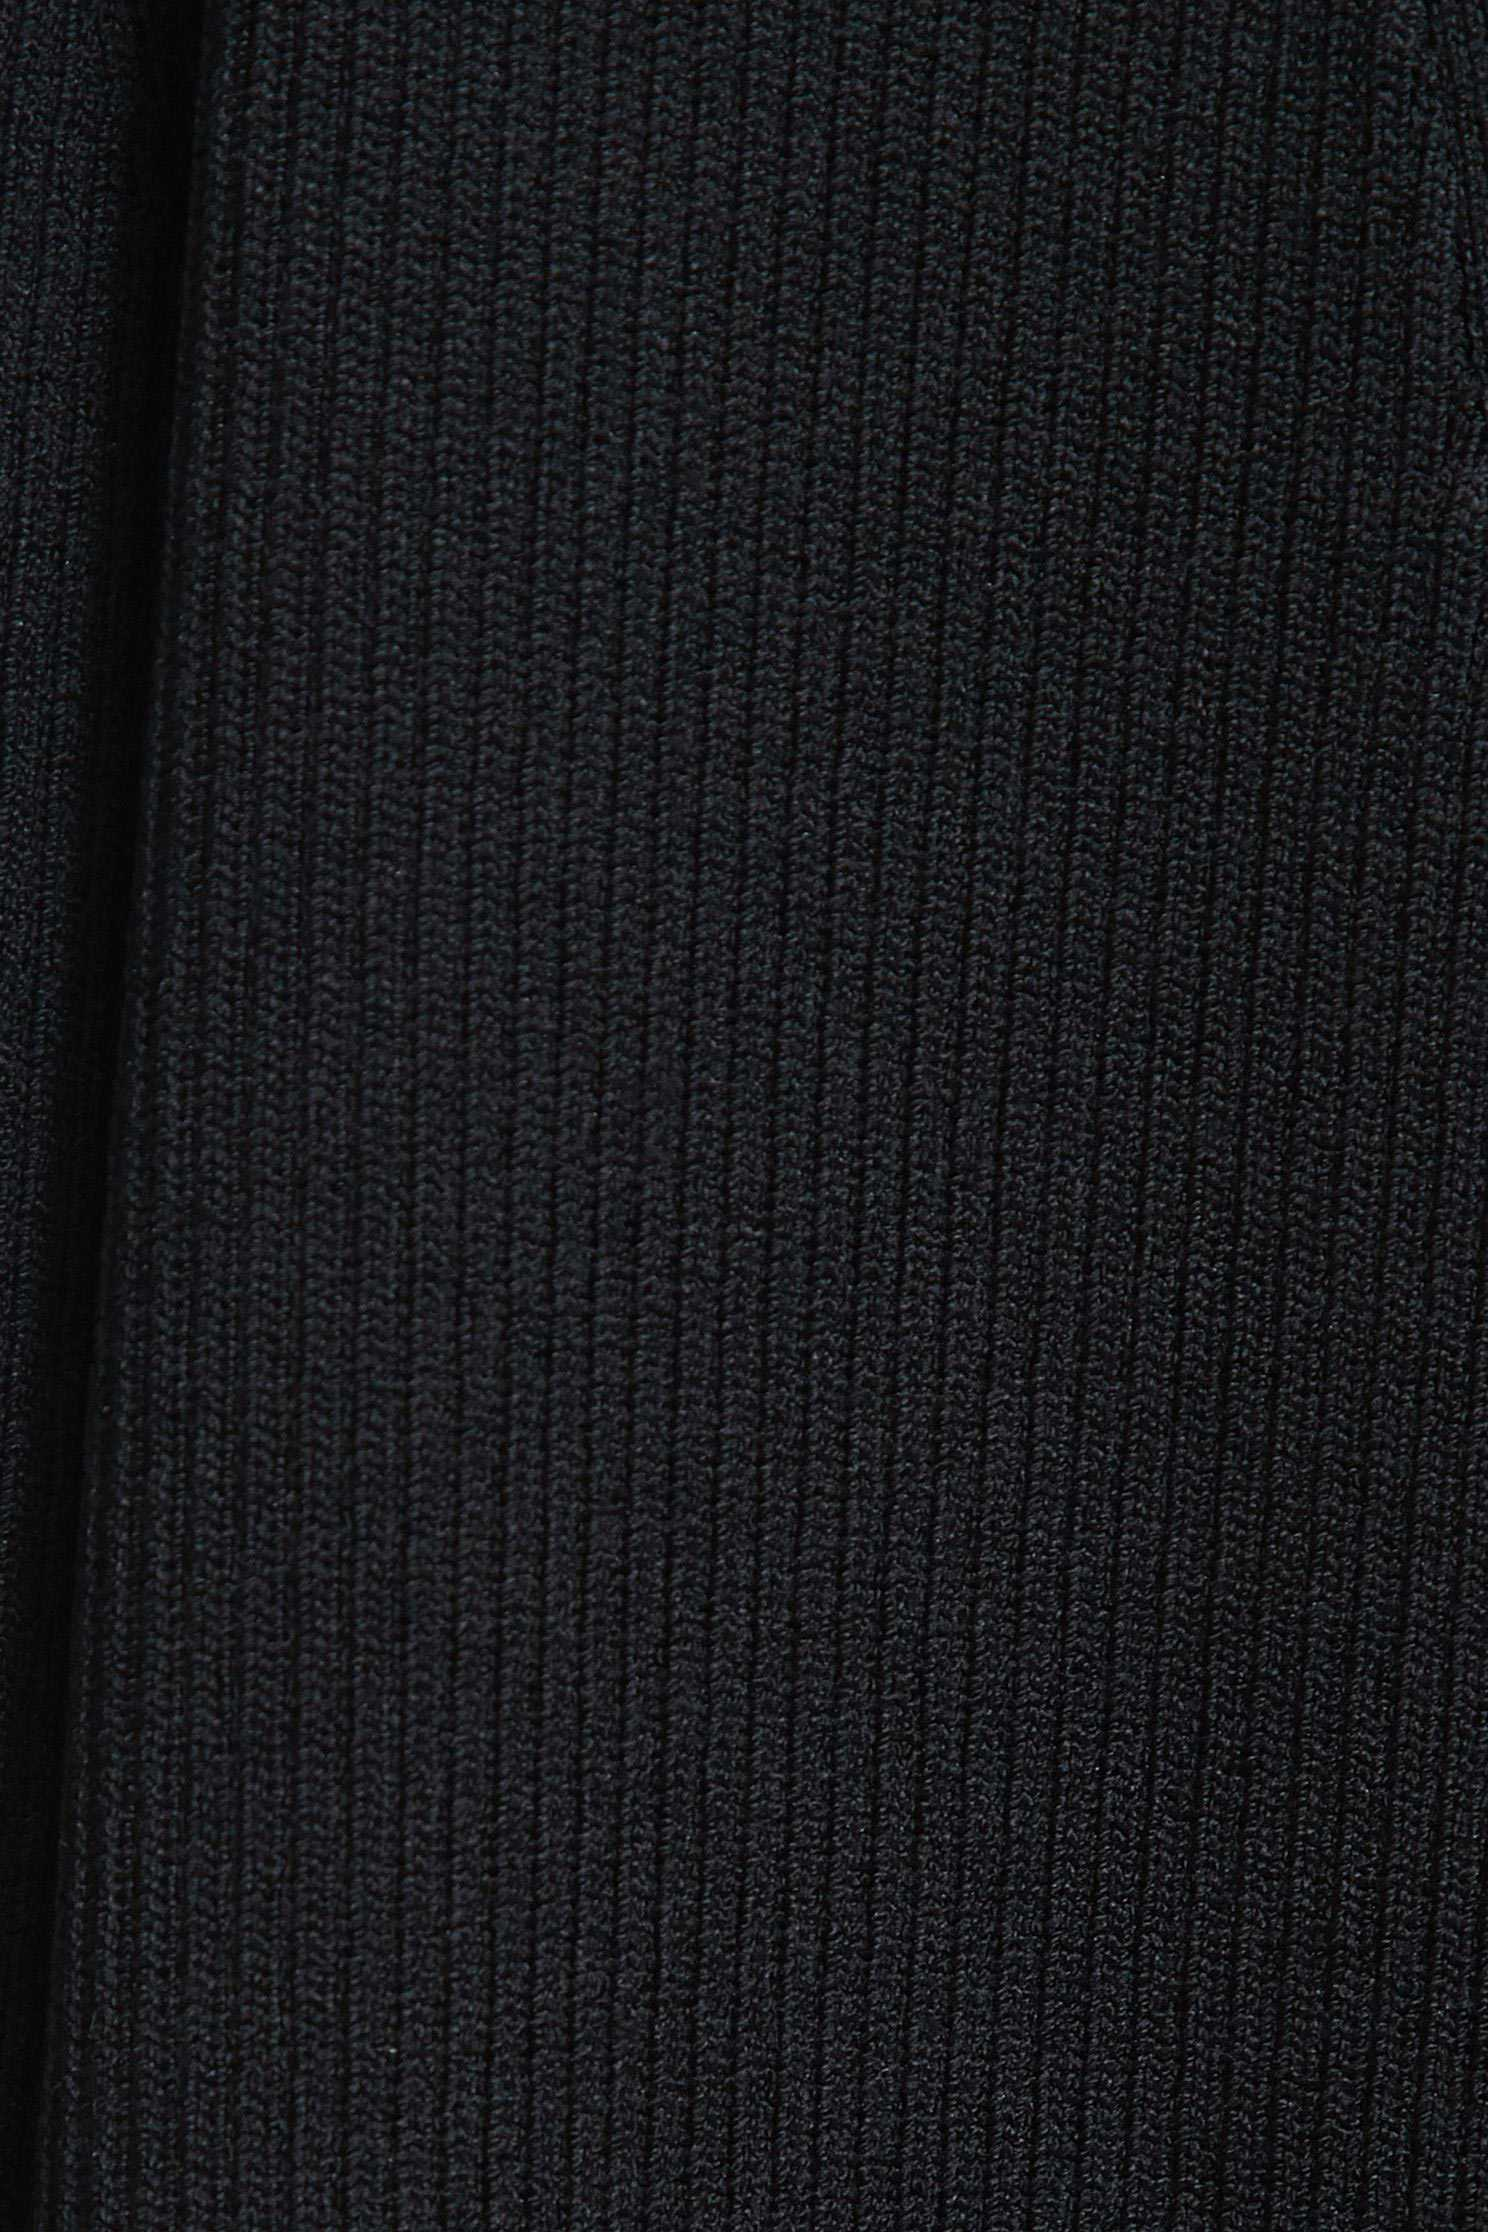 Stitching foldlong long knitted cardigan,coldforwinter,outerwear,knitting,knittedjacket,longcoat,longsleeveouterwear,chiffon,blackouterwear